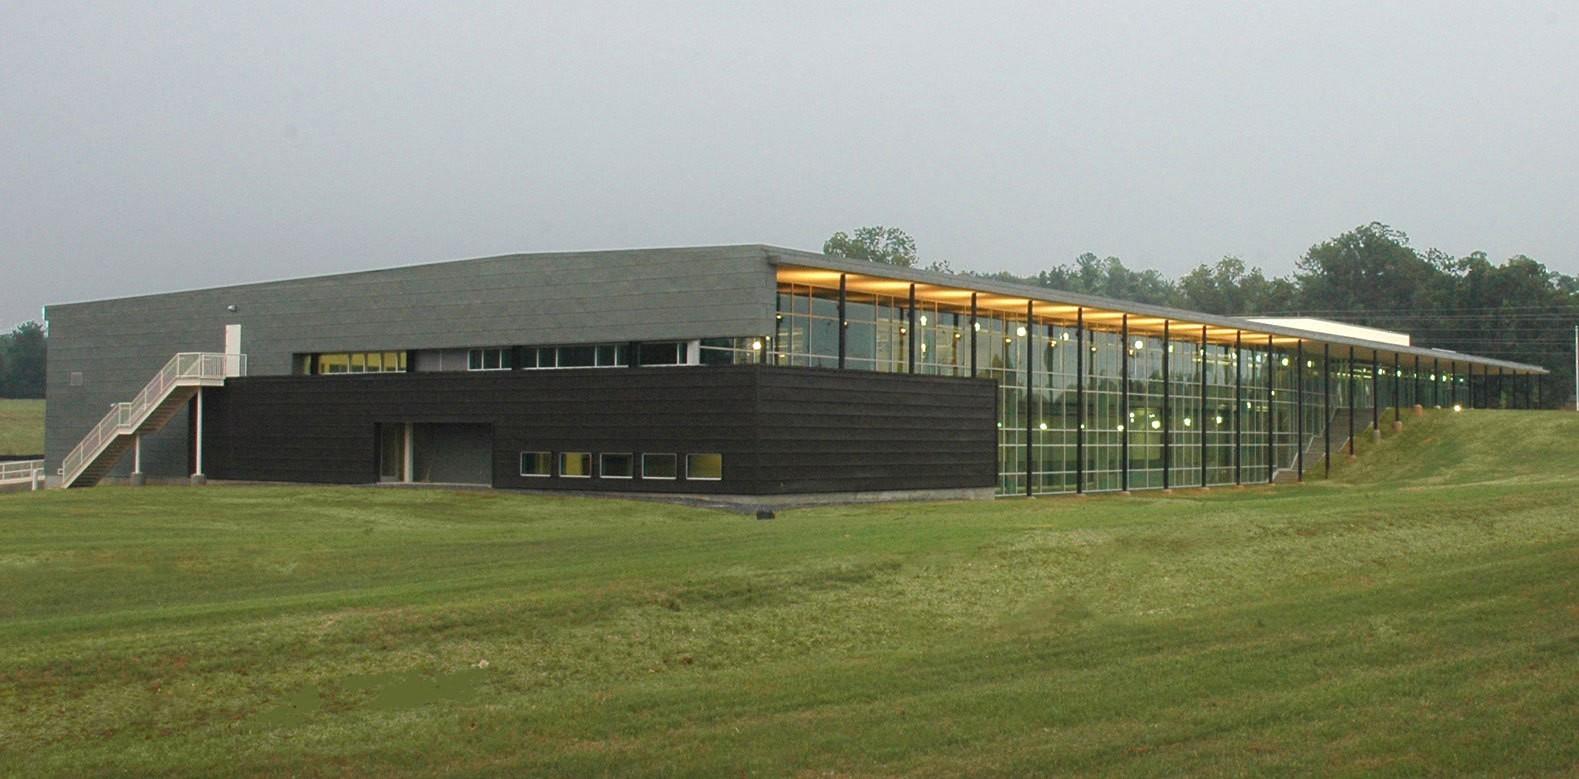 kia-training-center-exterior-sideview